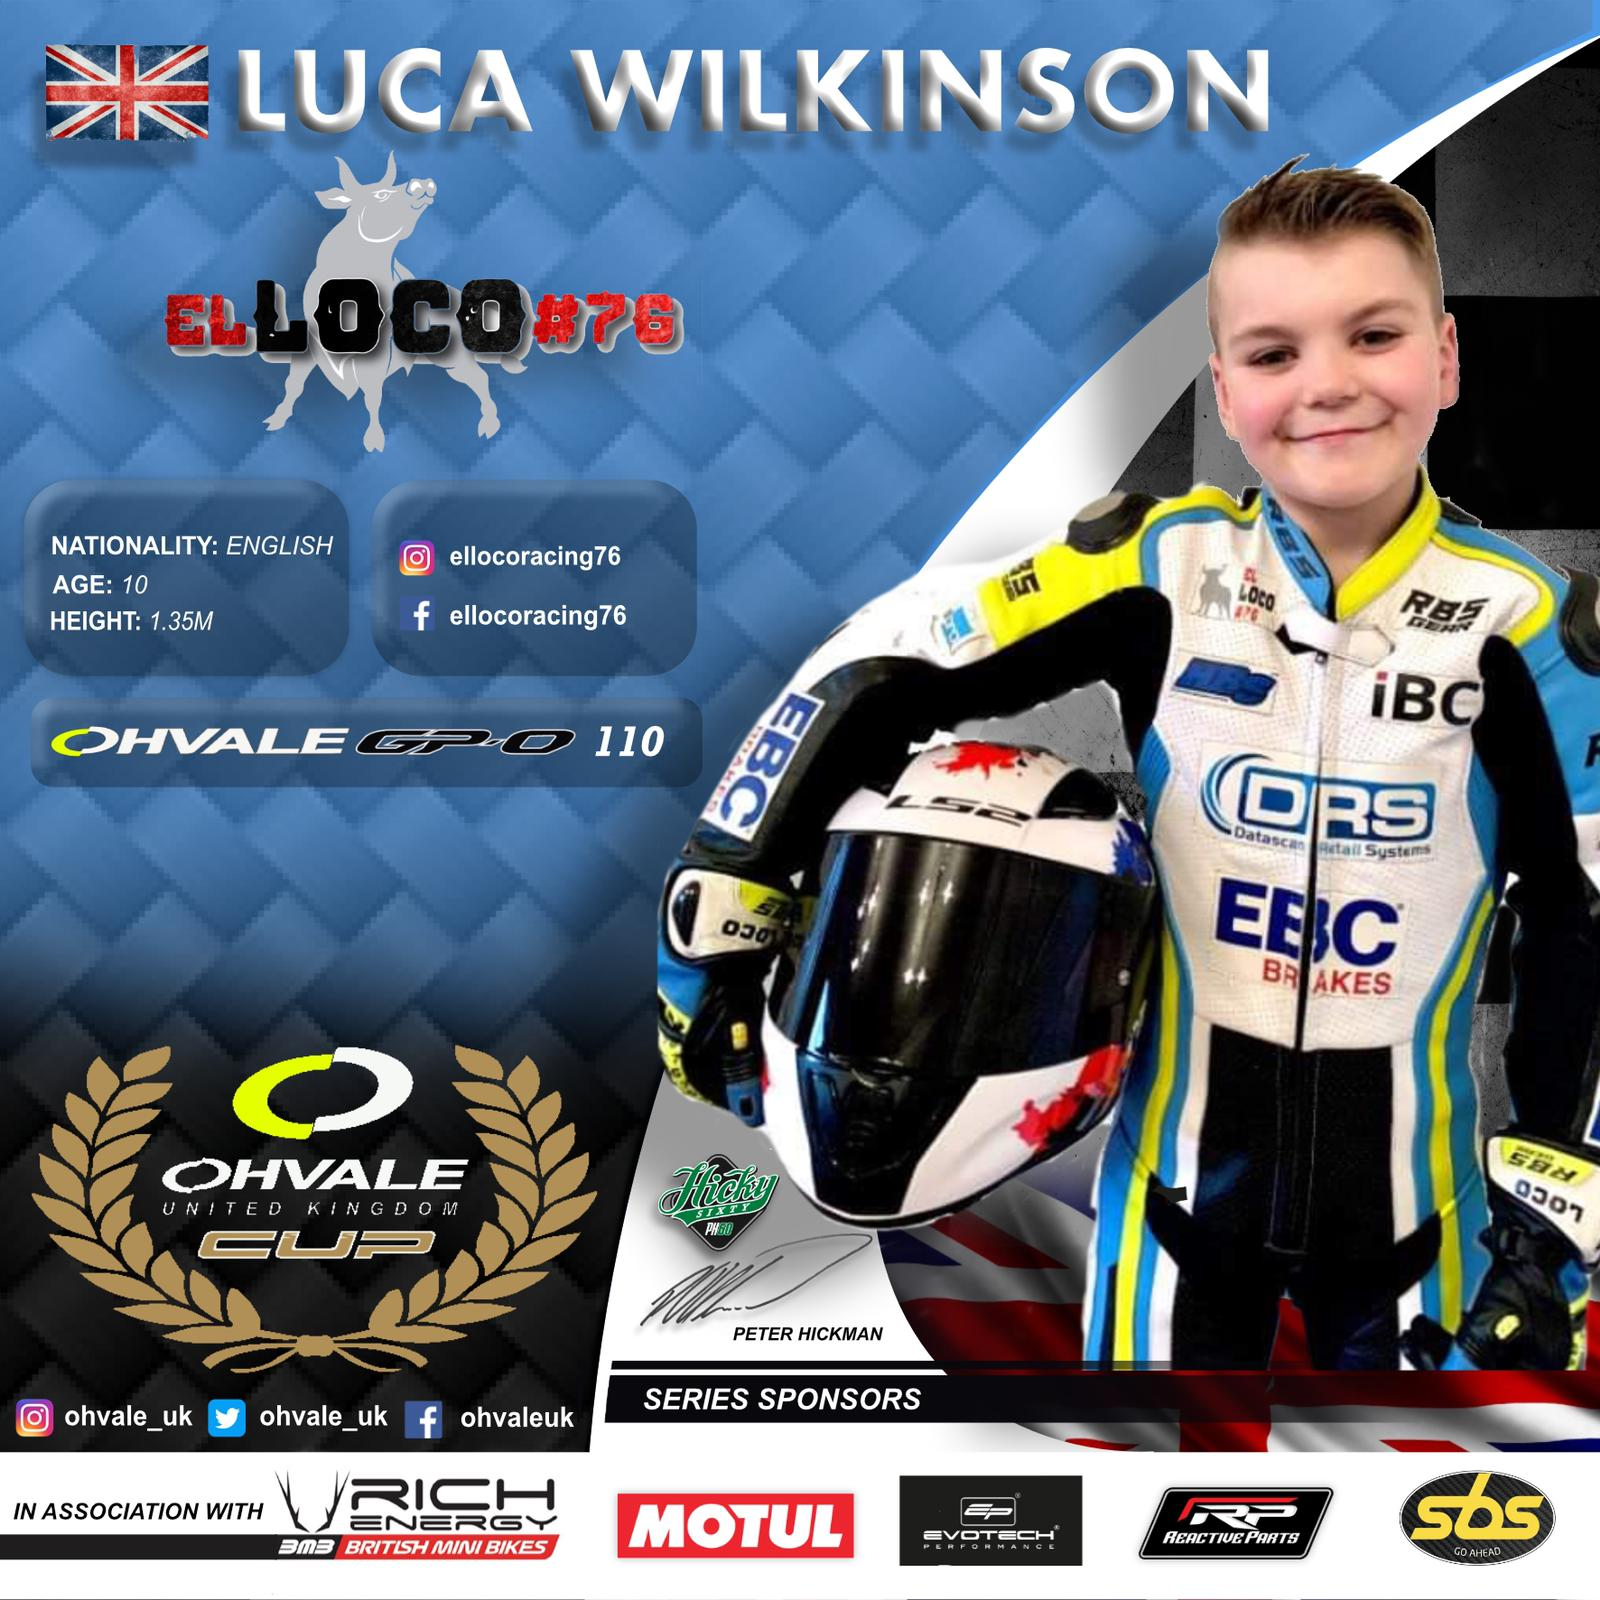 Luca Wilkinson - OHVALE Cup